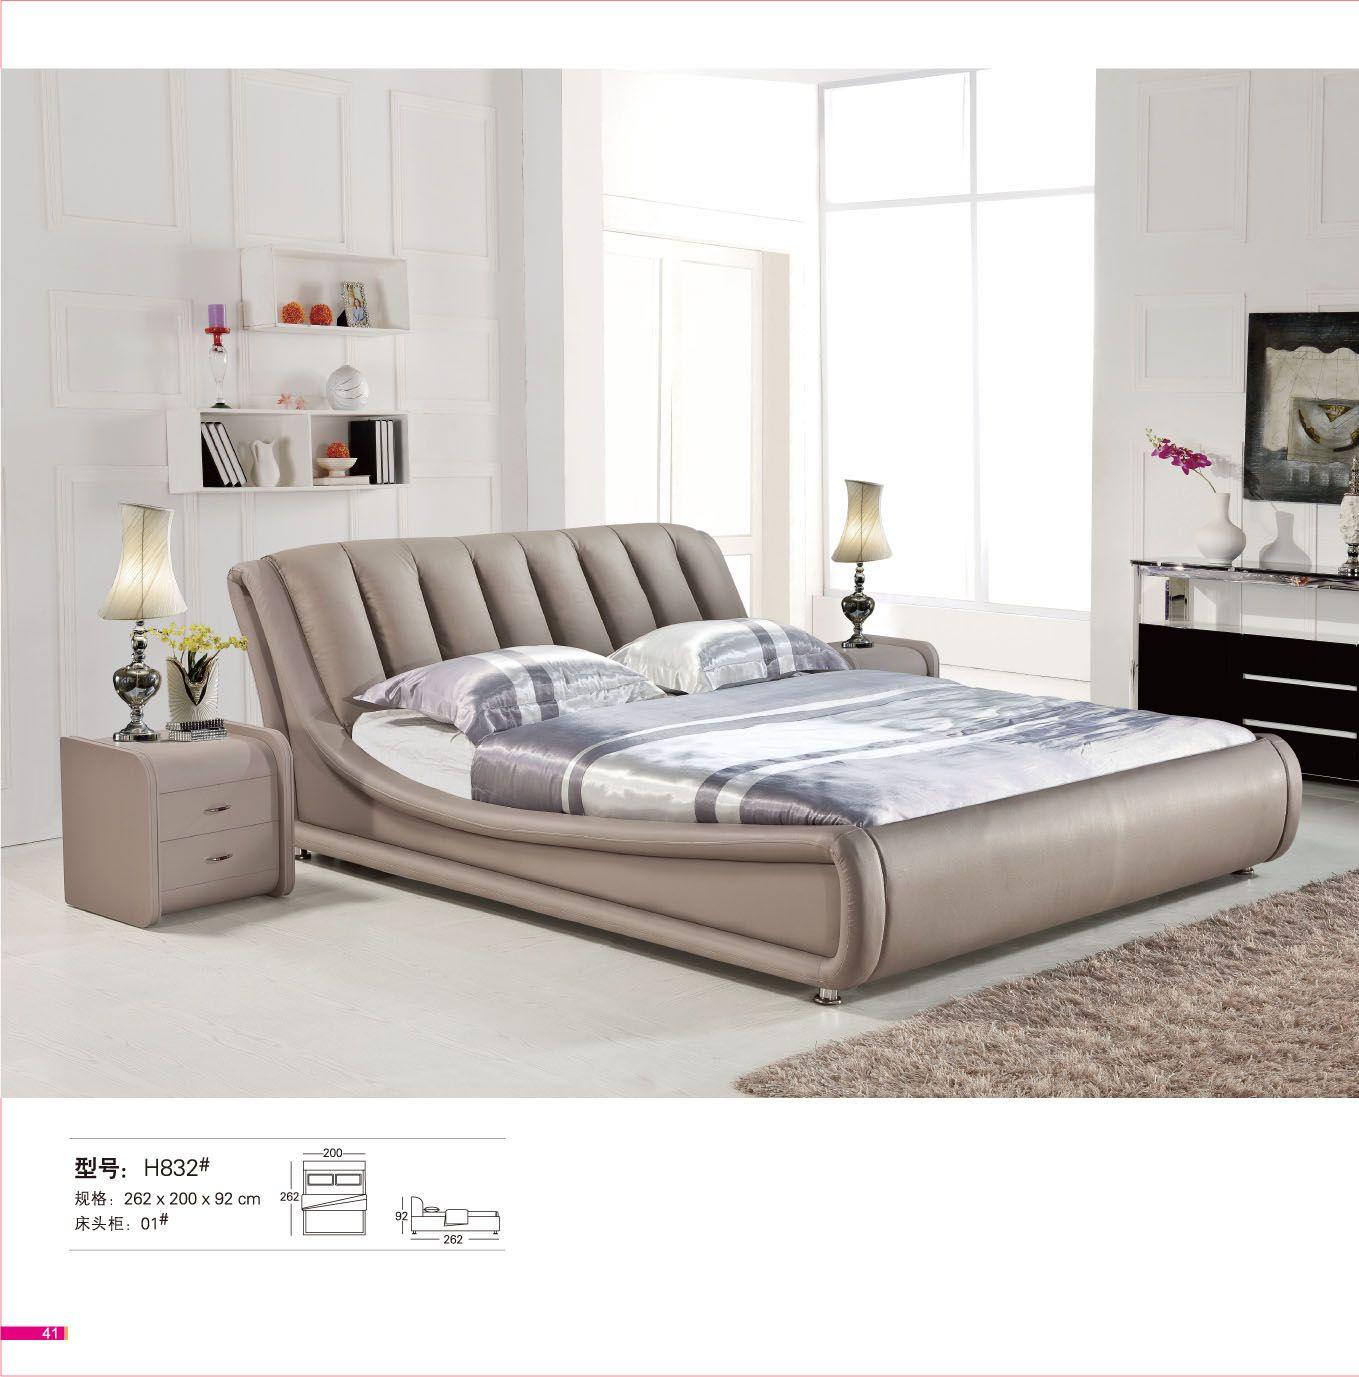 Best L H832 360 With Images Bedroom Sets Bedroom Decor 640 x 480